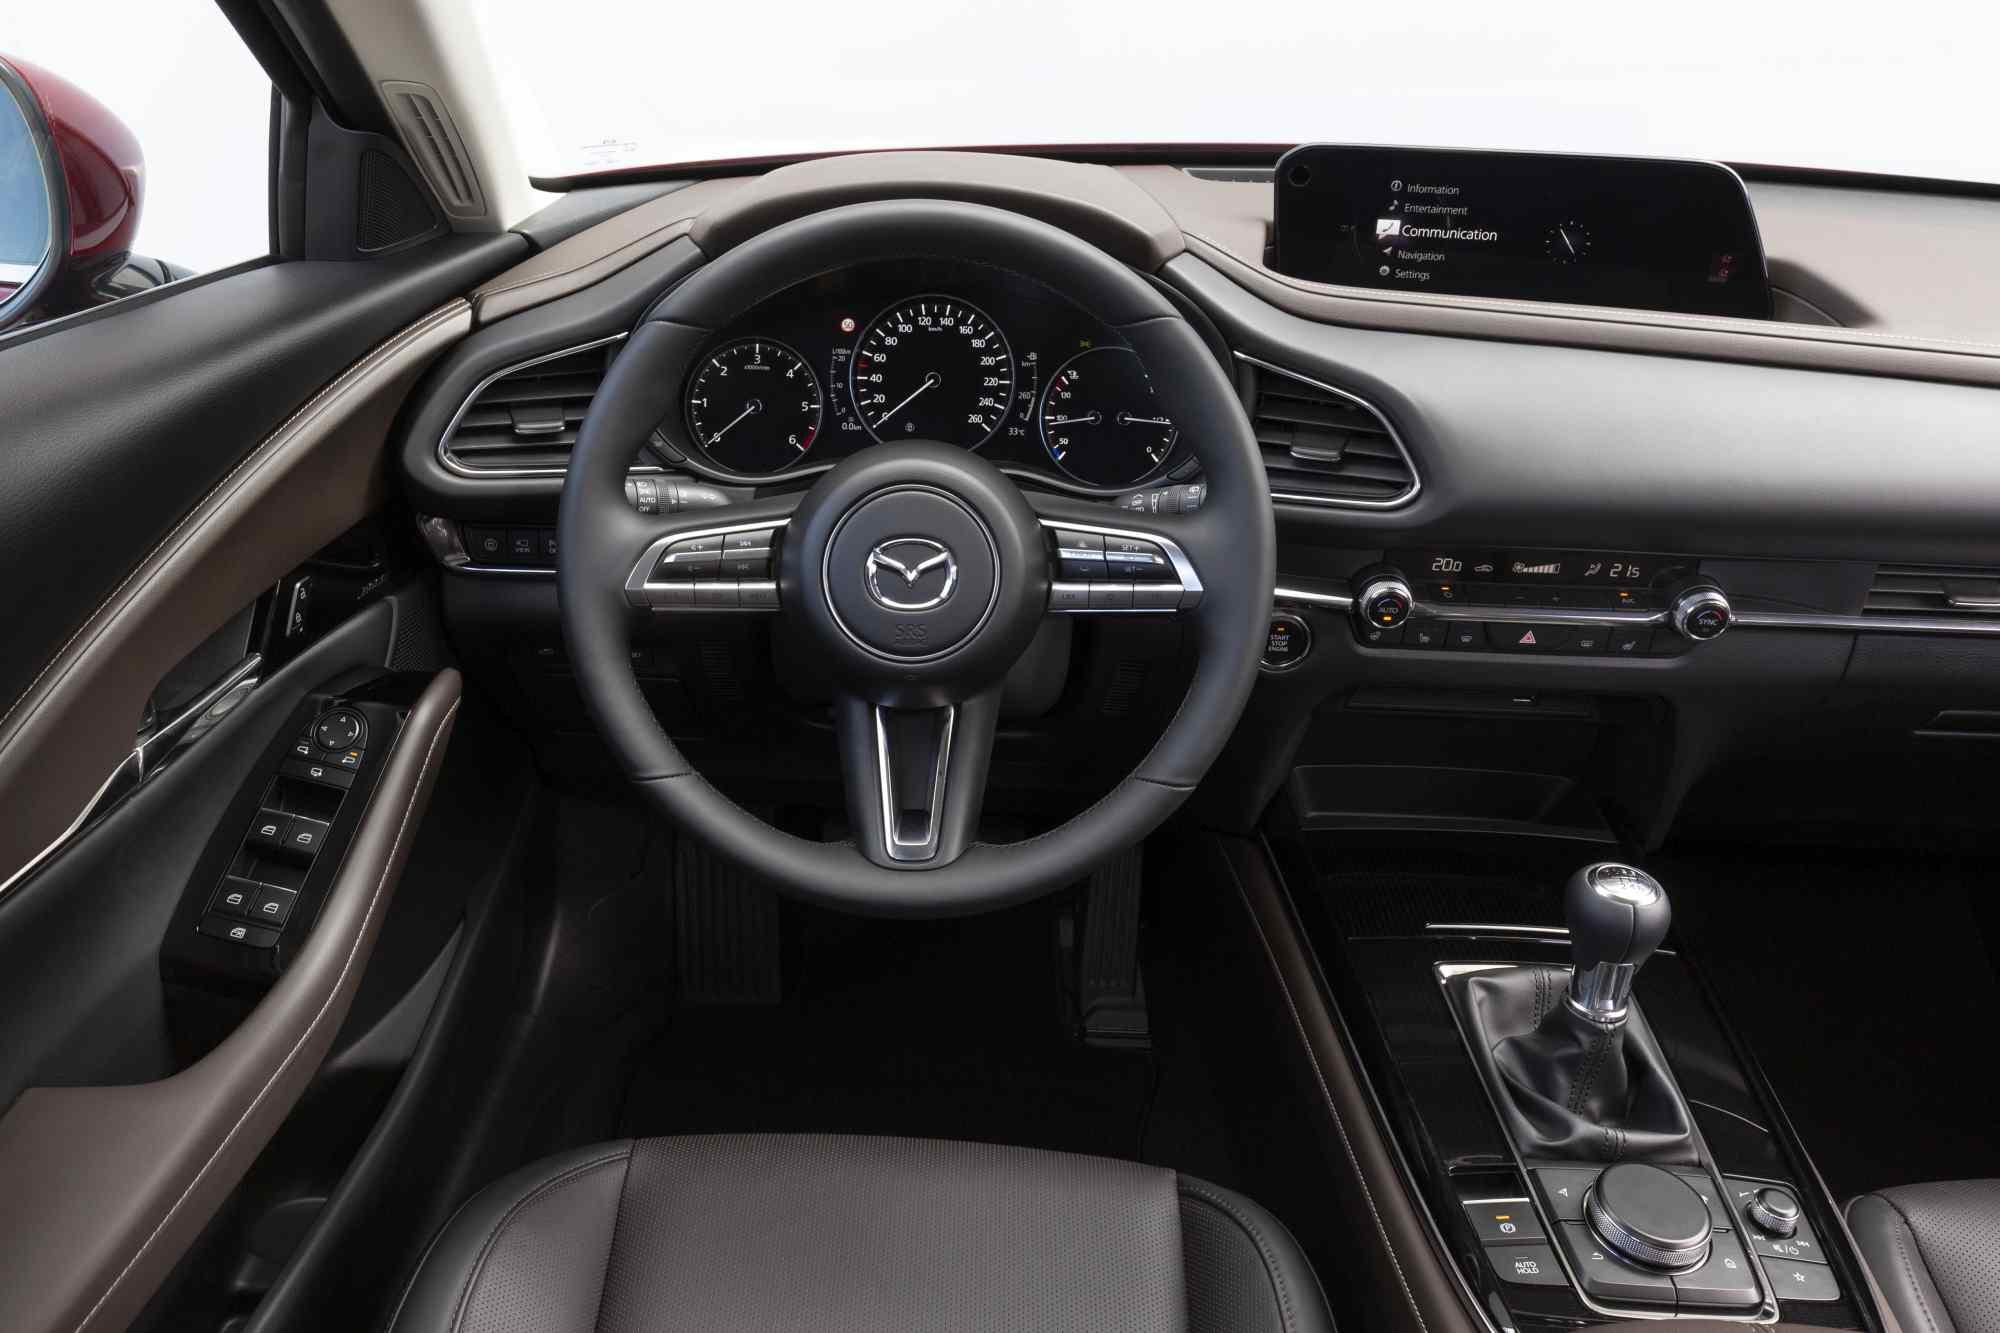 Mazda_CX-30_Girona2019_Interior_05.jpg